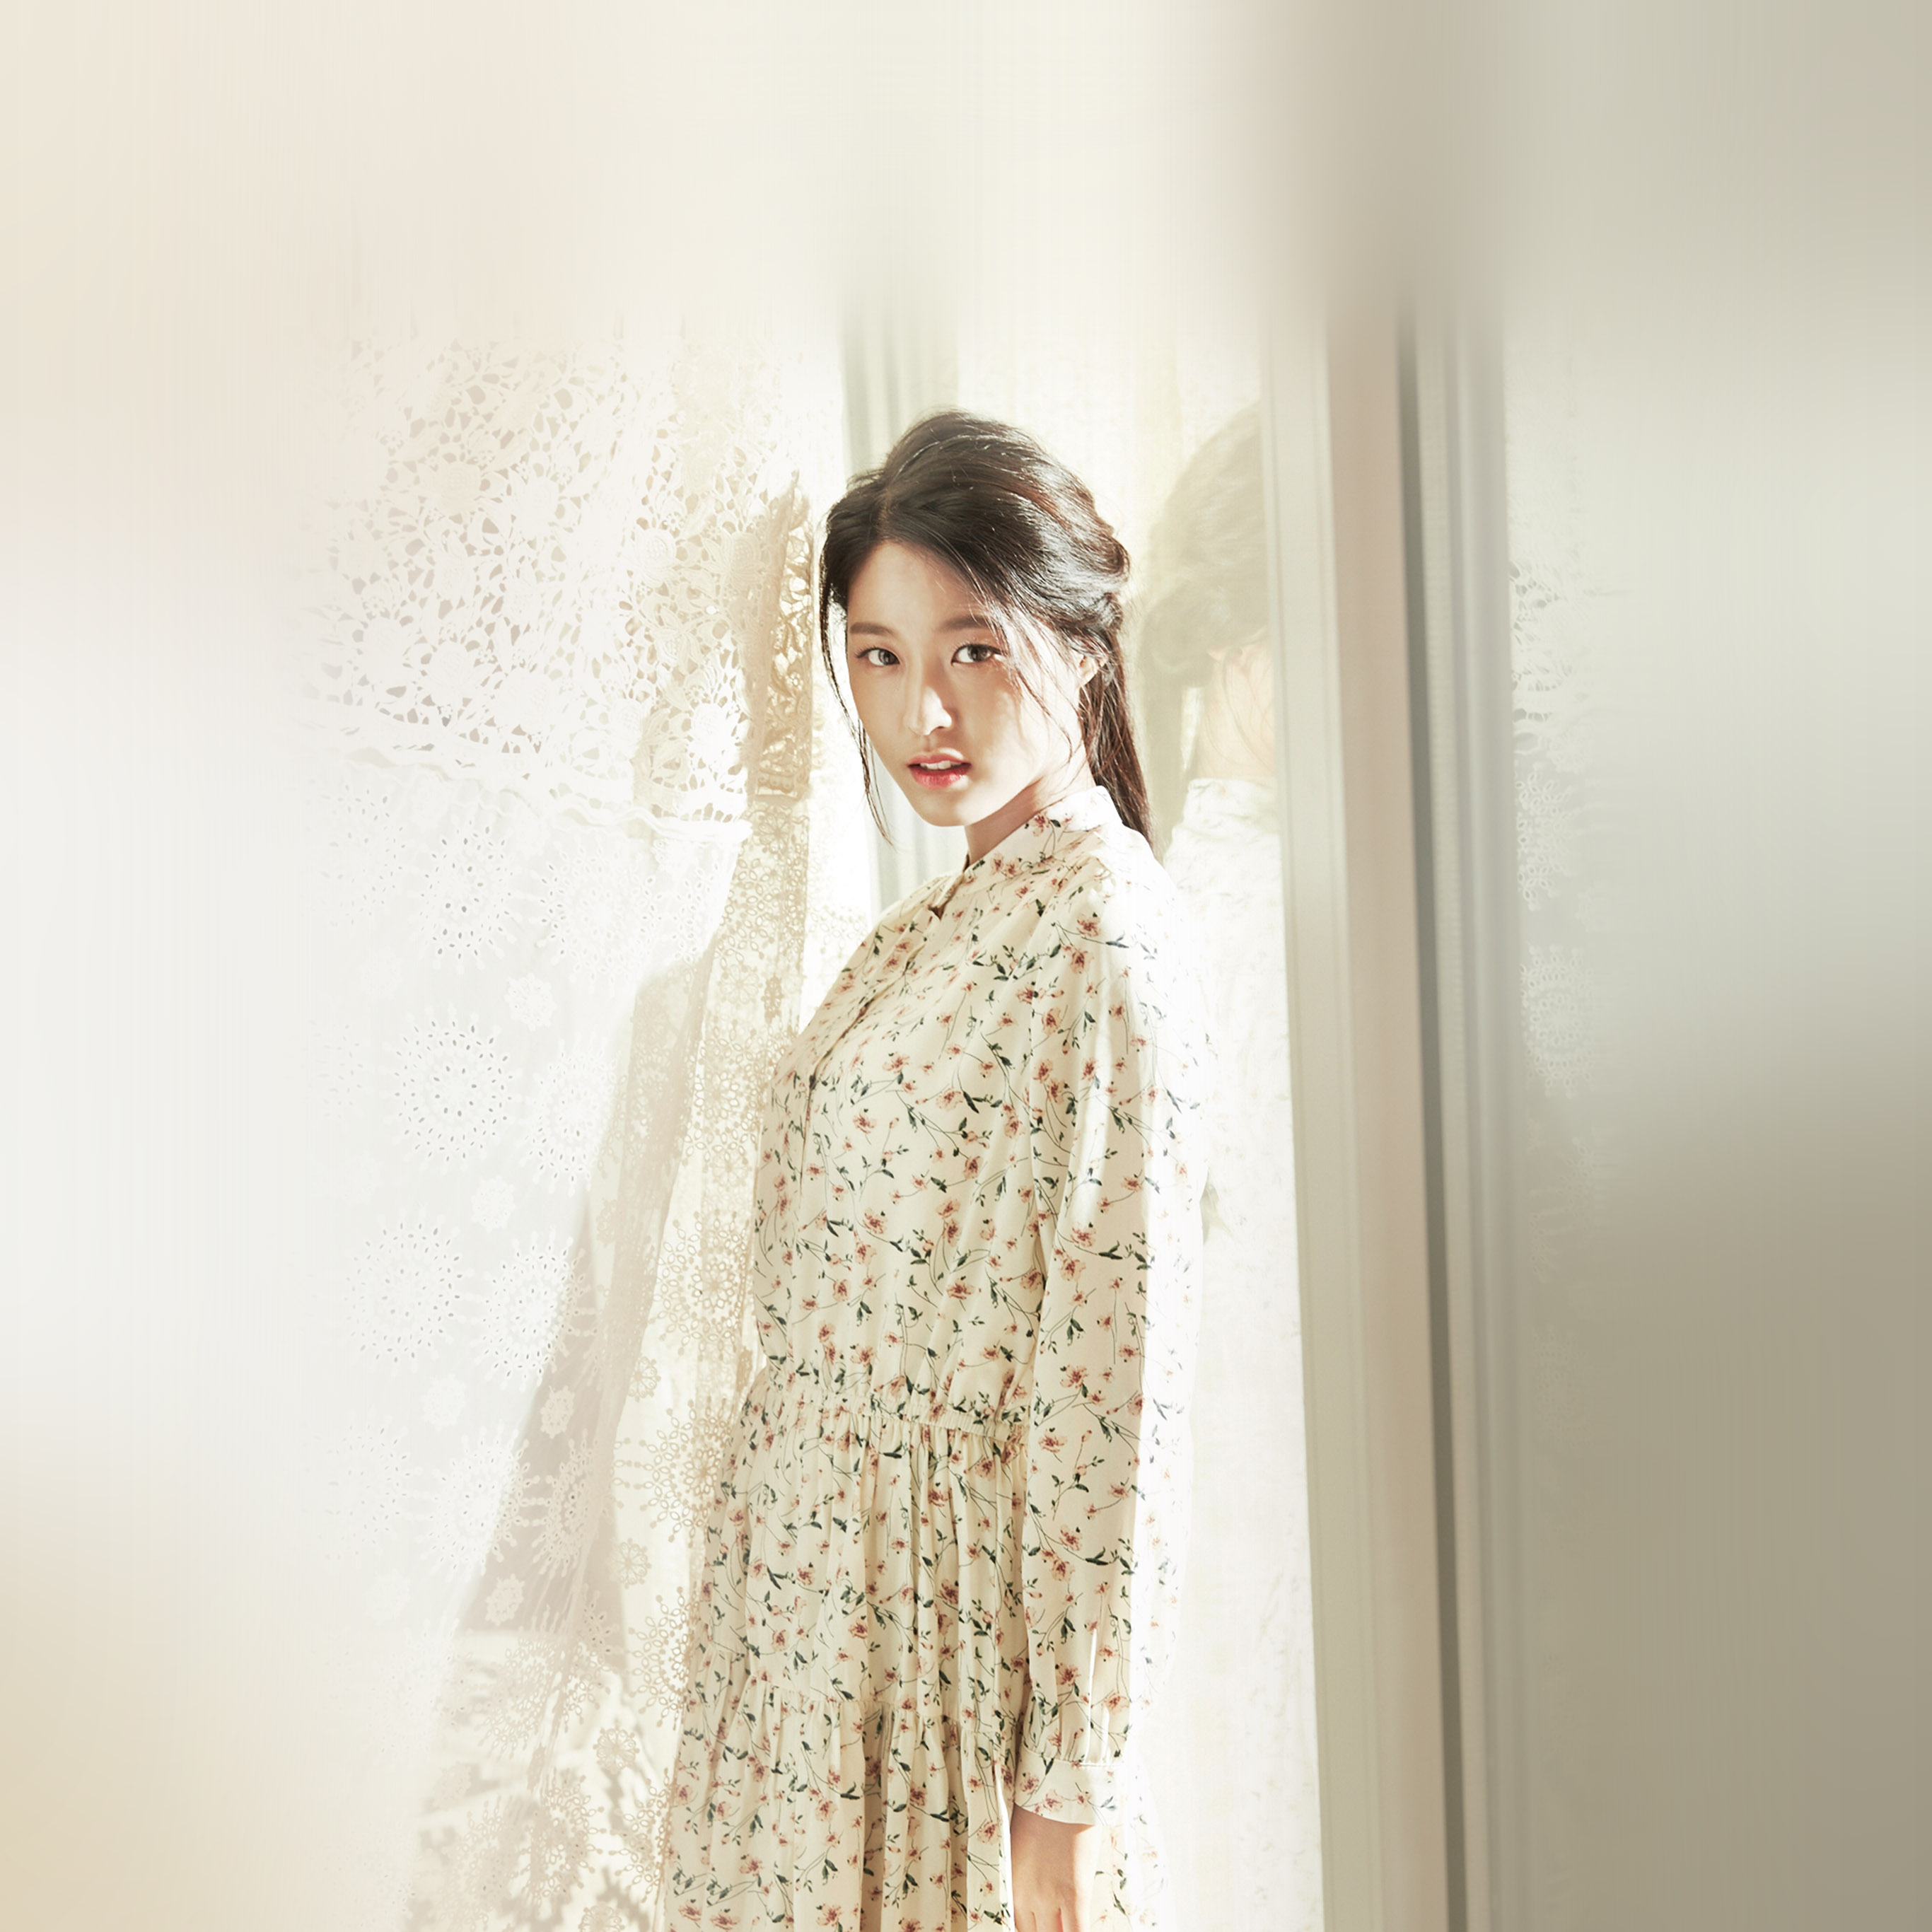 Papersco Ipad Wallpaper Ho44 Girl Sulhyun Cute Smile Kpop